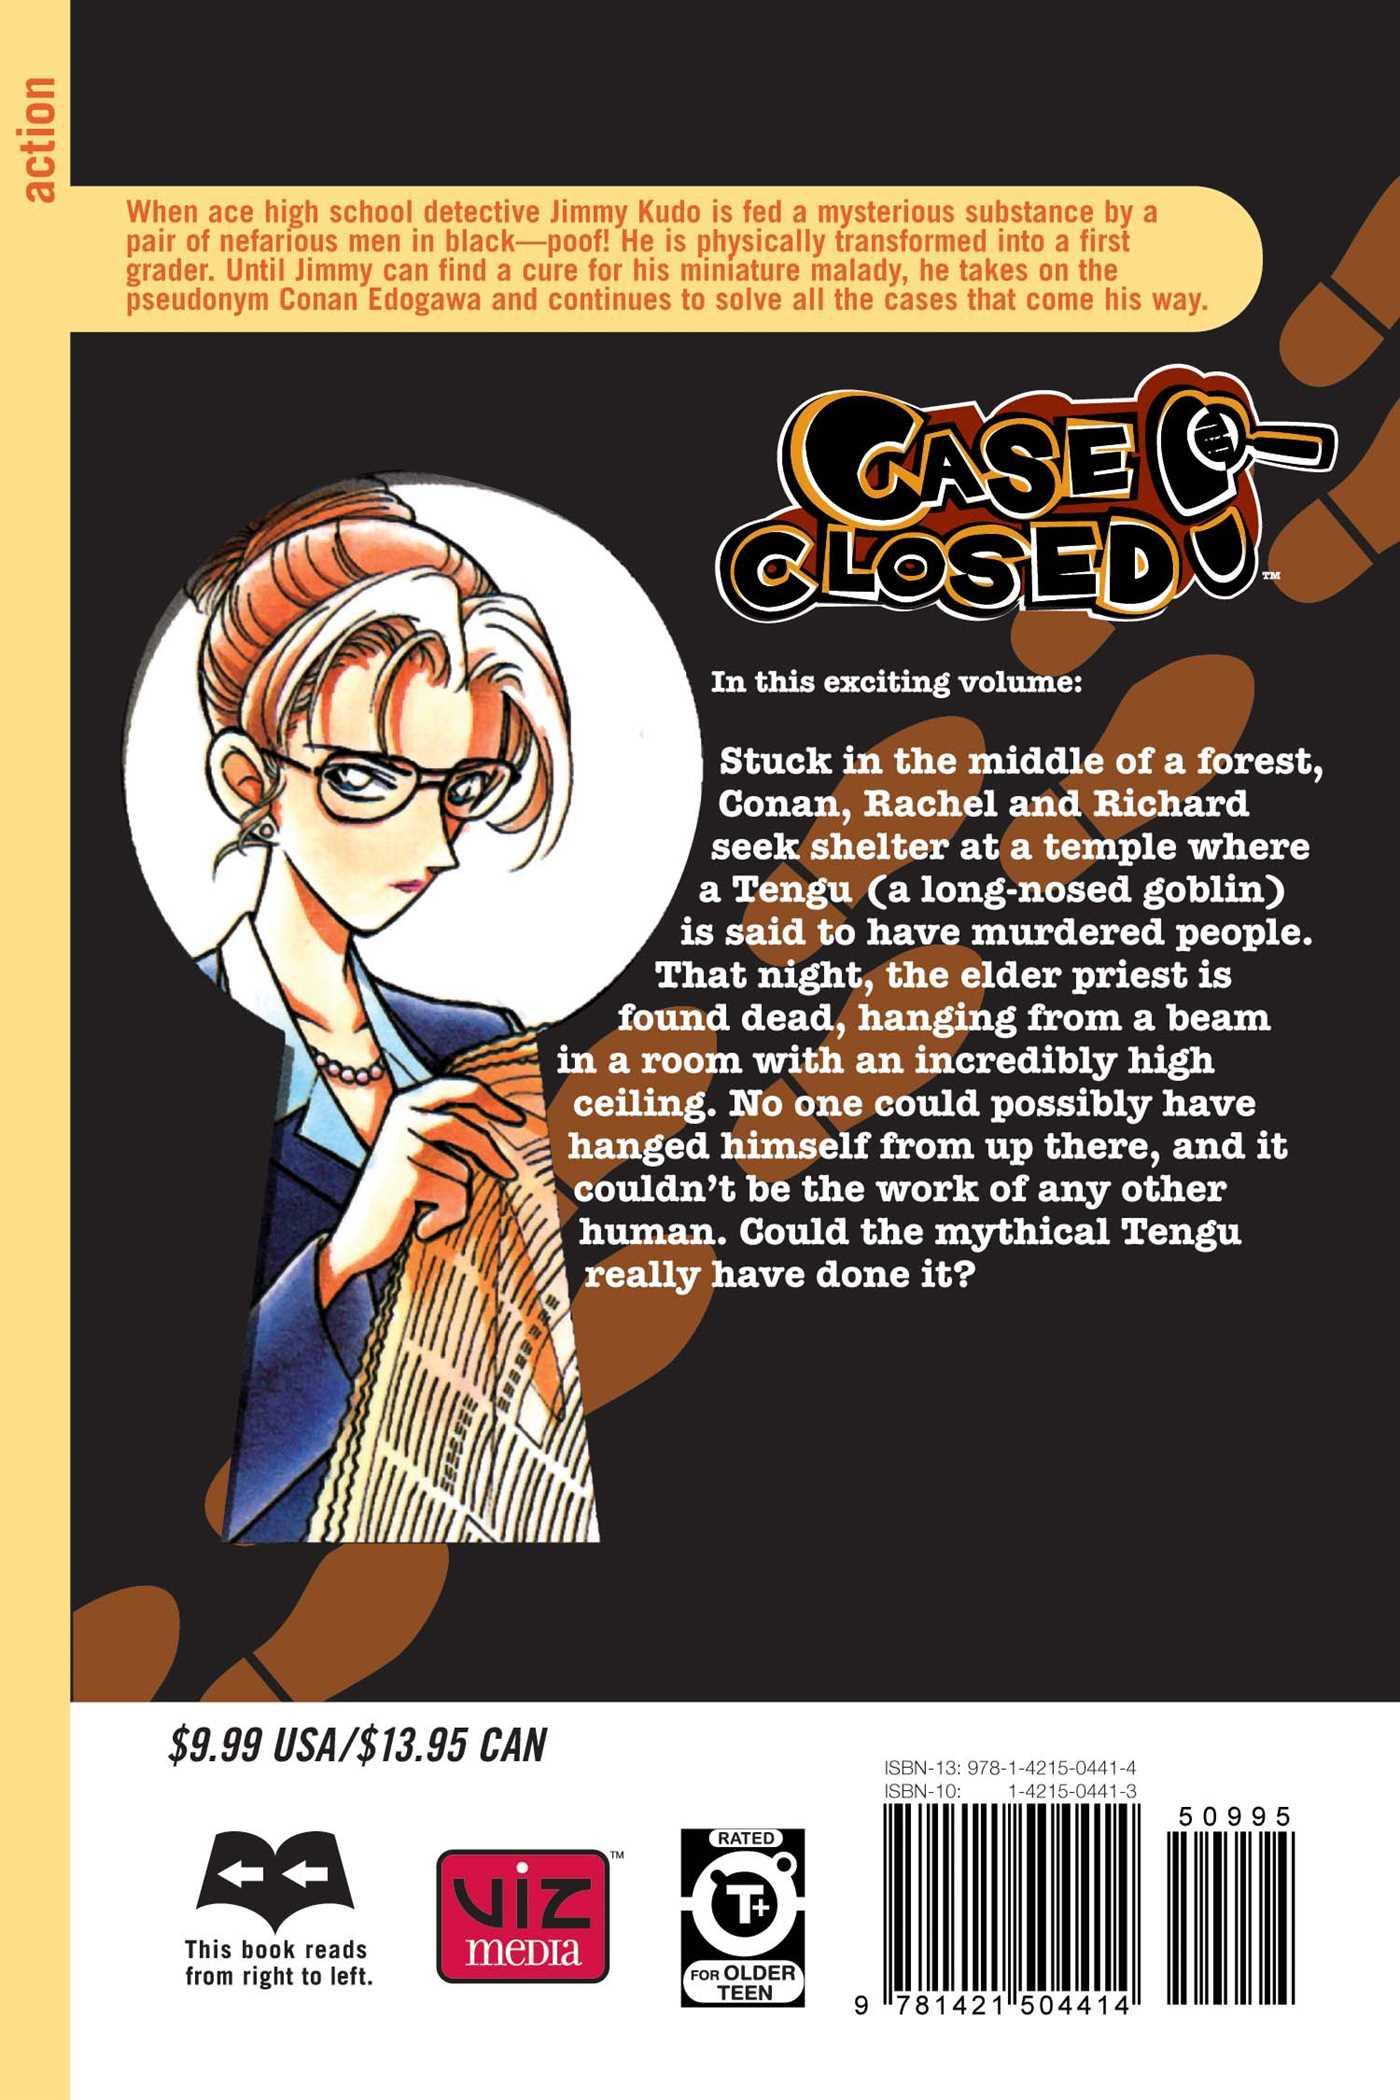 Case closed vol 11 9781421504414 hr back